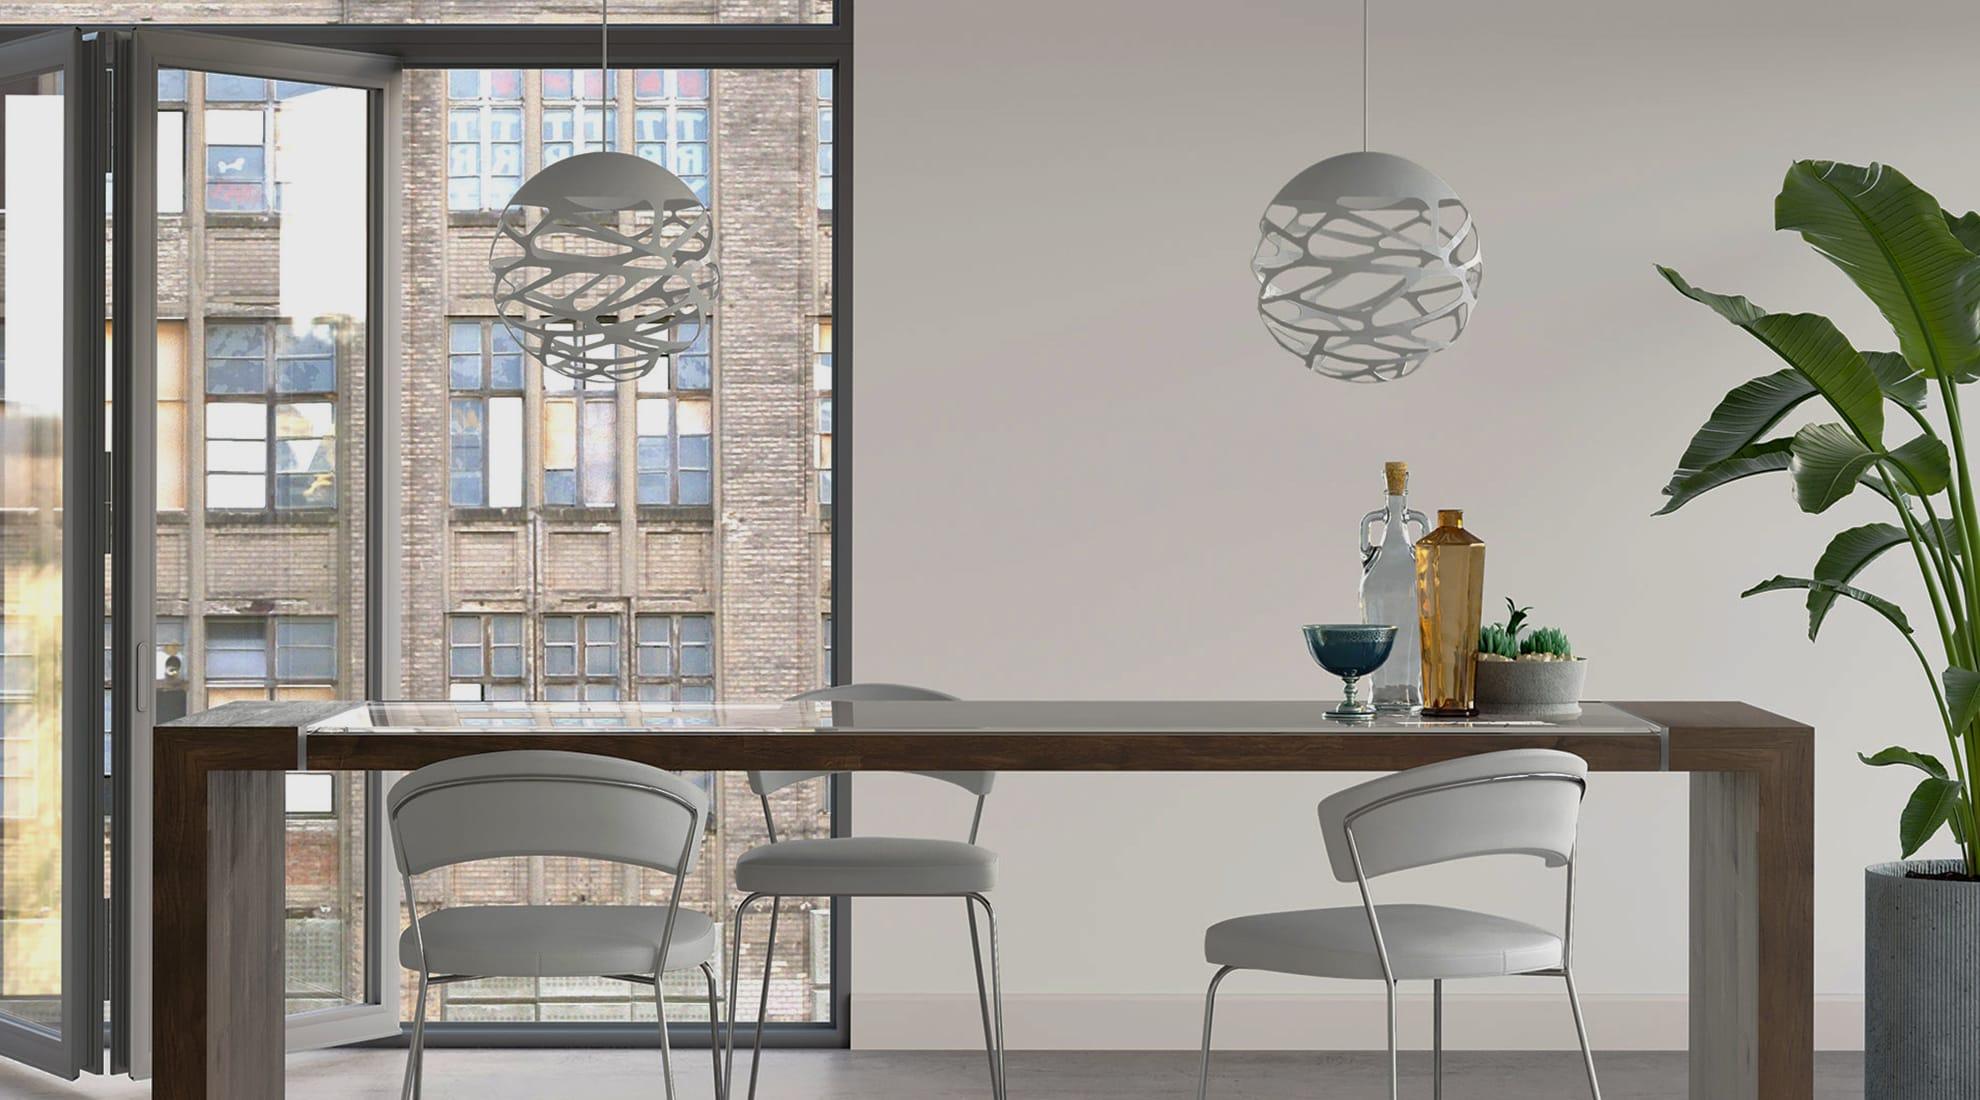 Delancey Stool by Modloft and Kelly Sphere Pendant by Studio Italia Design